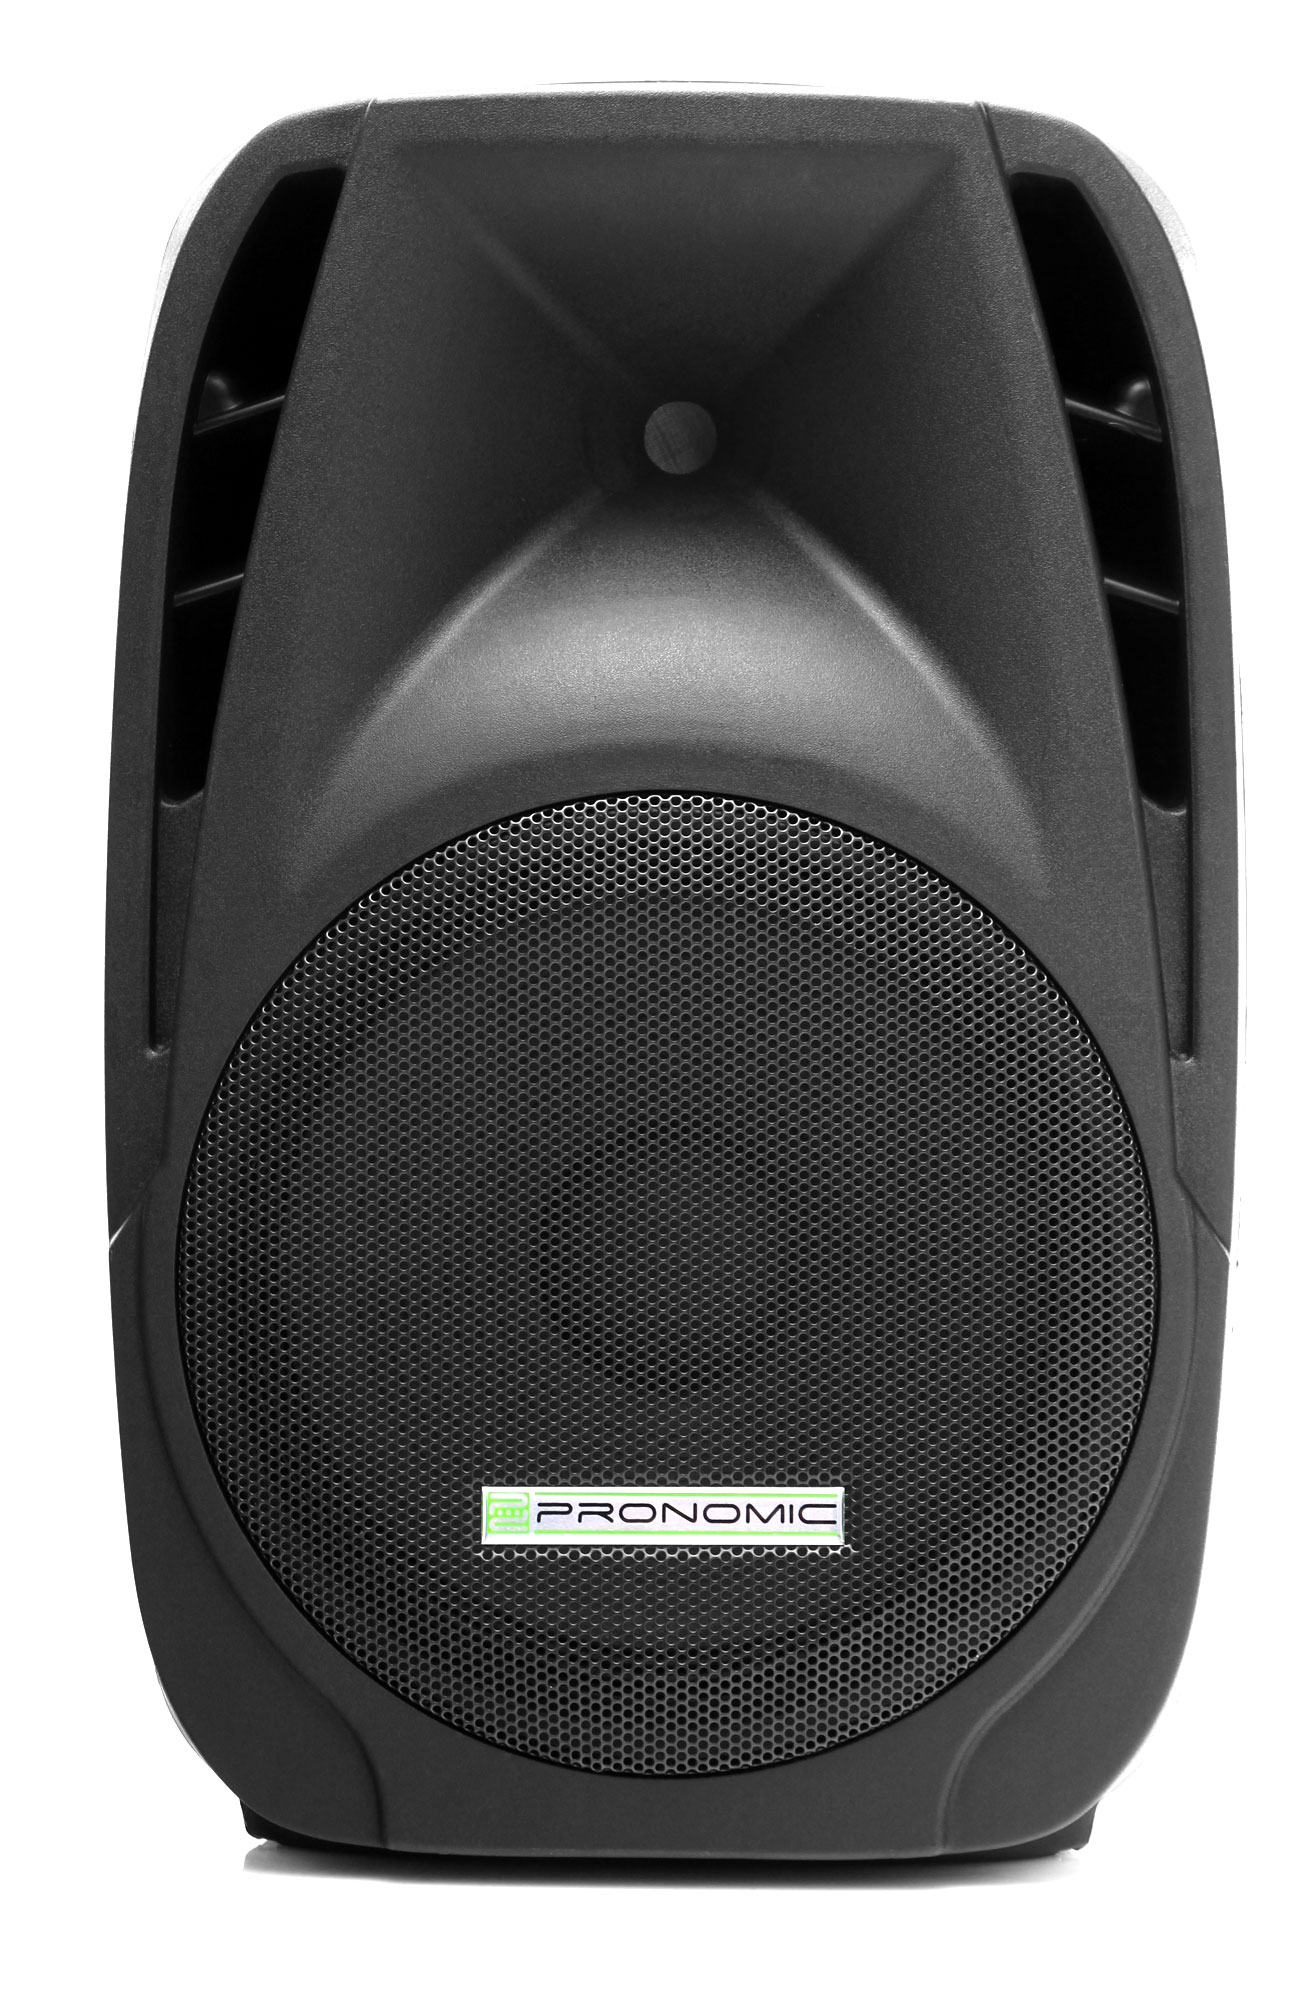 pronomic ph12a aktivboxen lautsprecher mp3 bluetooth 150 300 watt paar. Black Bedroom Furniture Sets. Home Design Ideas